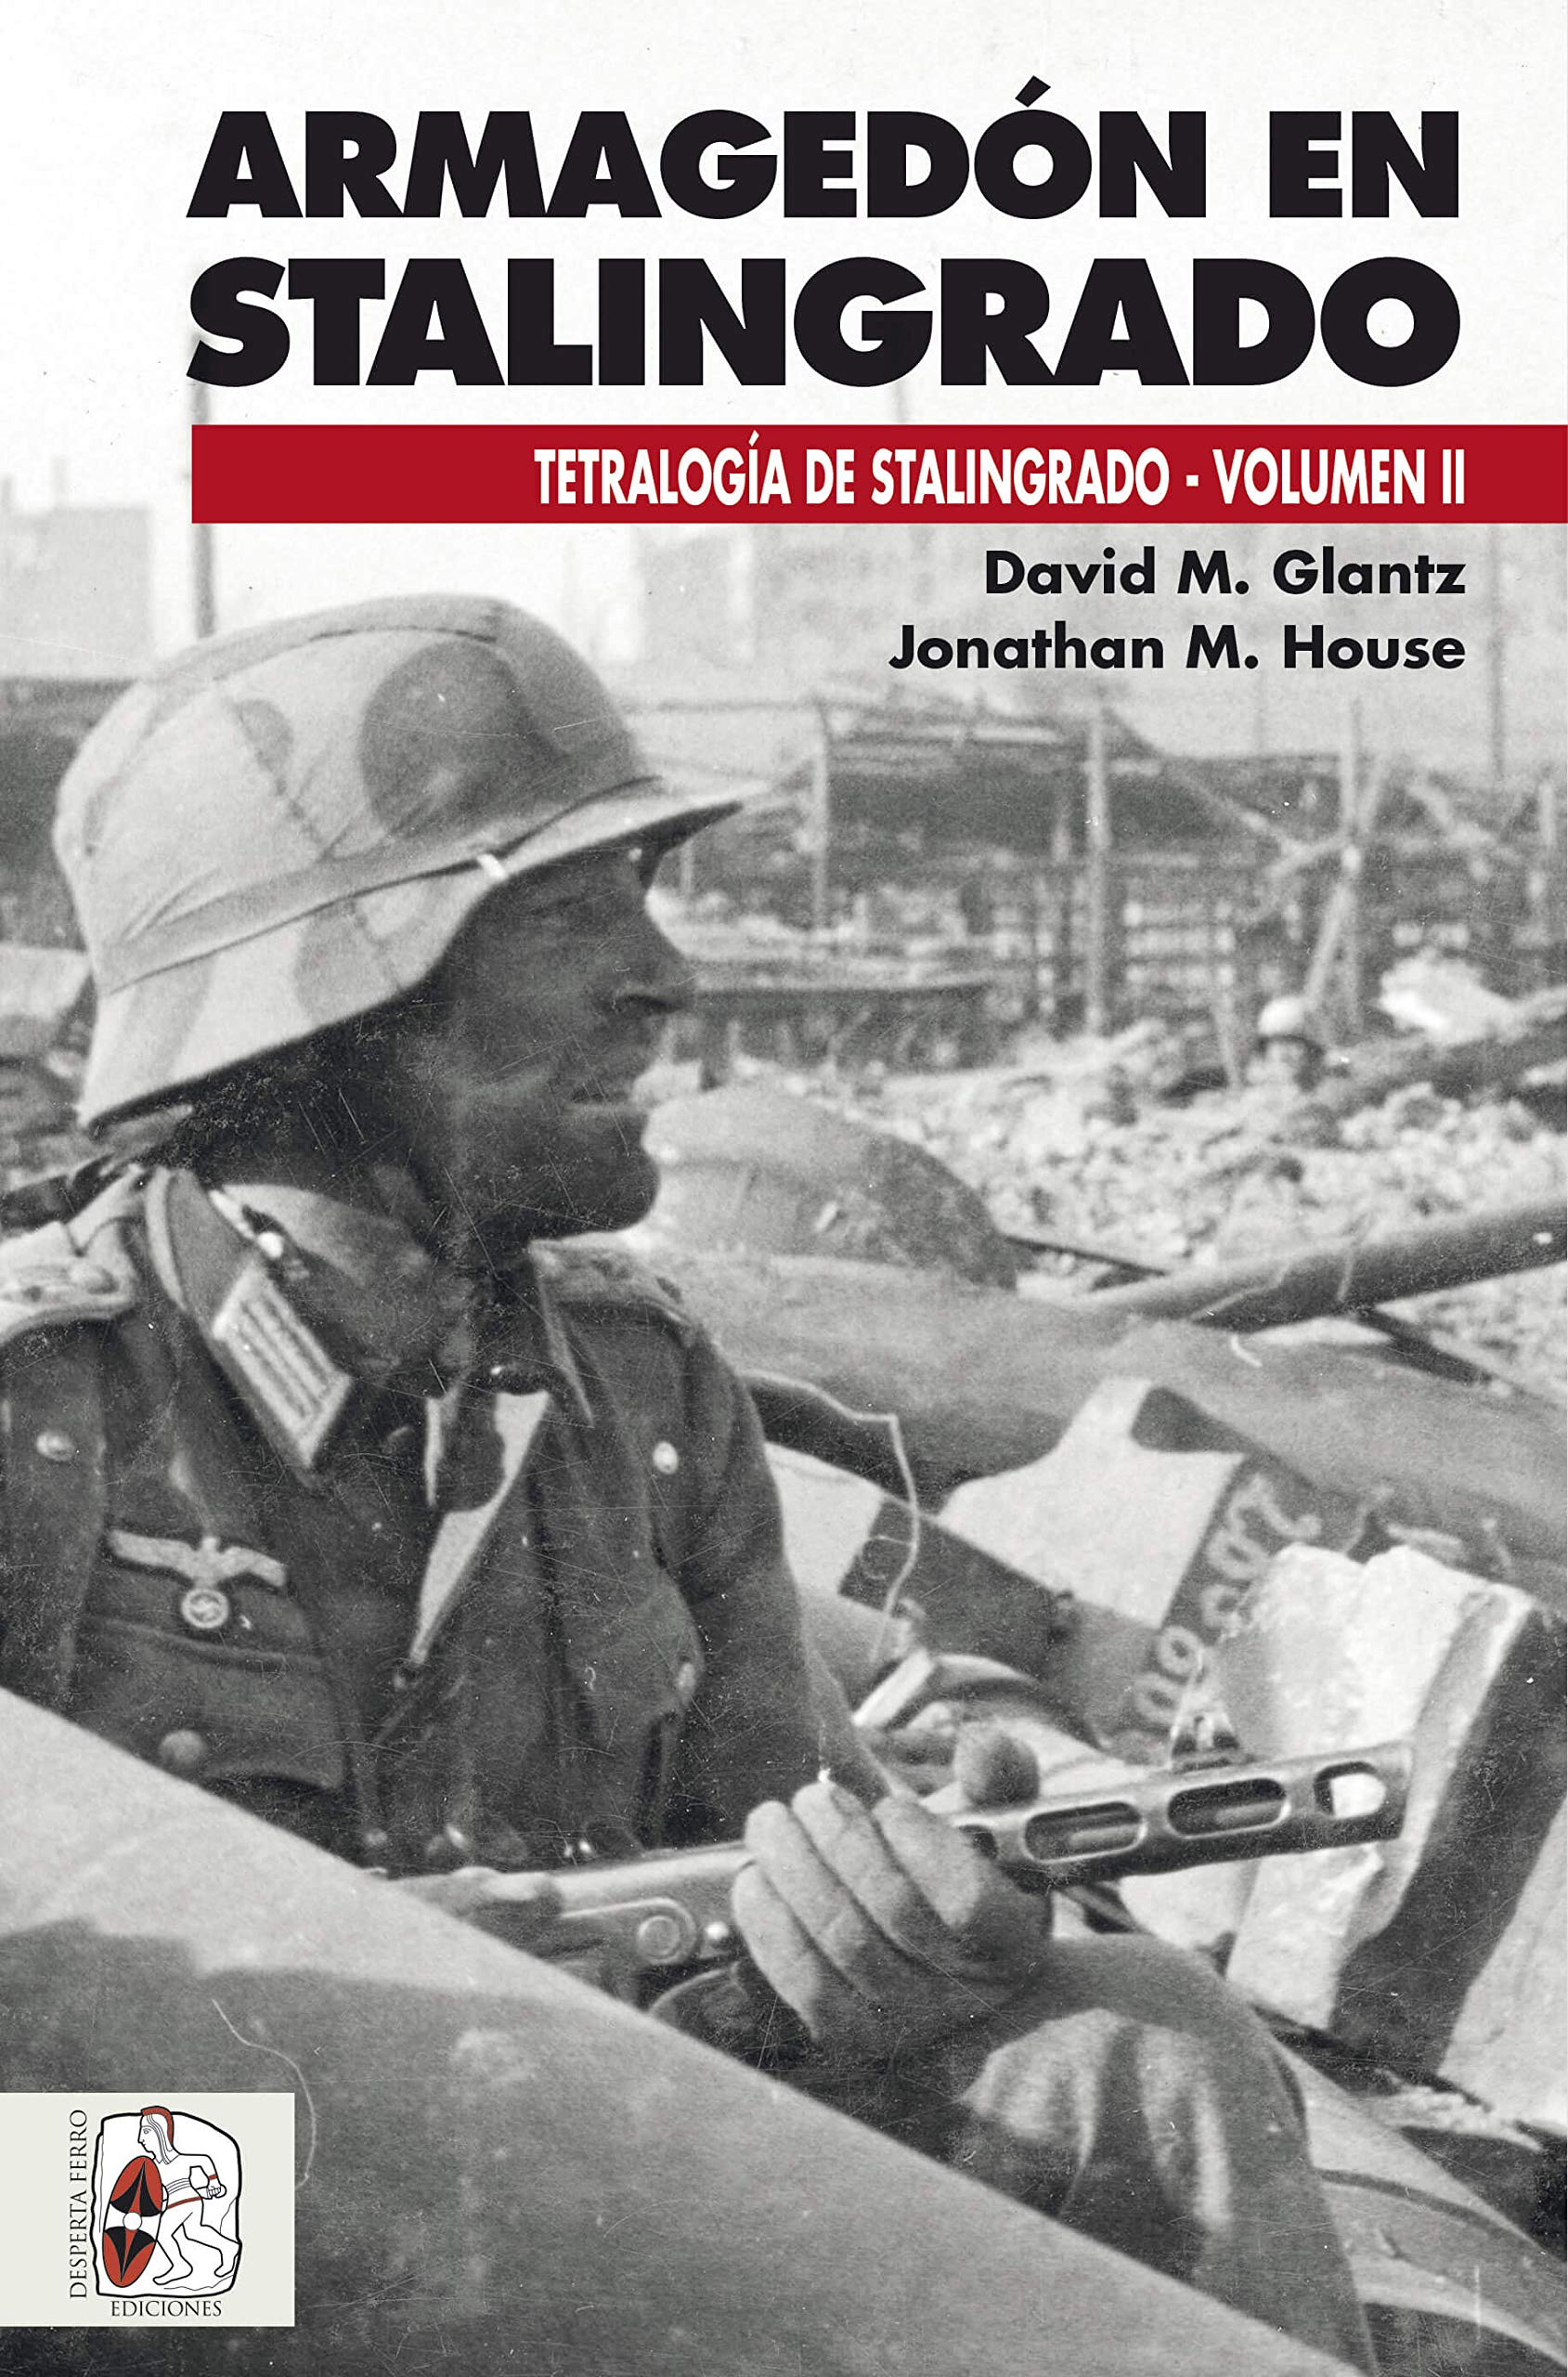 Armagedón en Stalingrado: Operaciones germano-soviéticas de septiembre a noviembre de 1942: 6 Segunda Guerra Mundial: Amazon.es: Glantz, David M., House, Jonathan M., Cañete Carrasco, Hugo A.: Libros